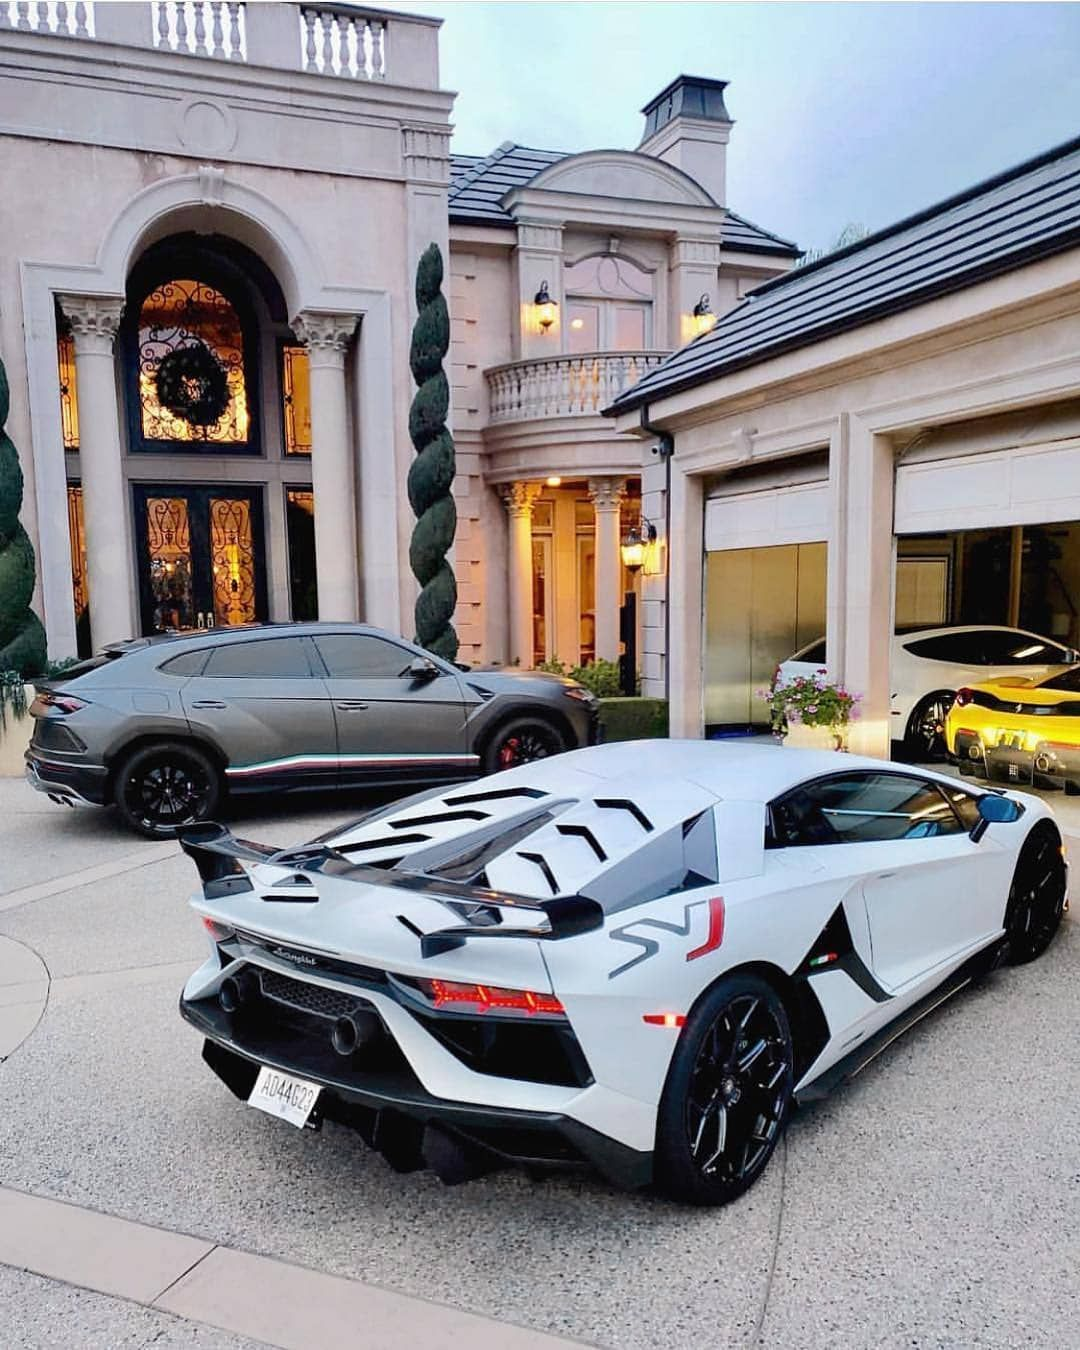 Most Luxury Things On Instagram Choose Luxury Cars Luxury Luxury Lifestyle